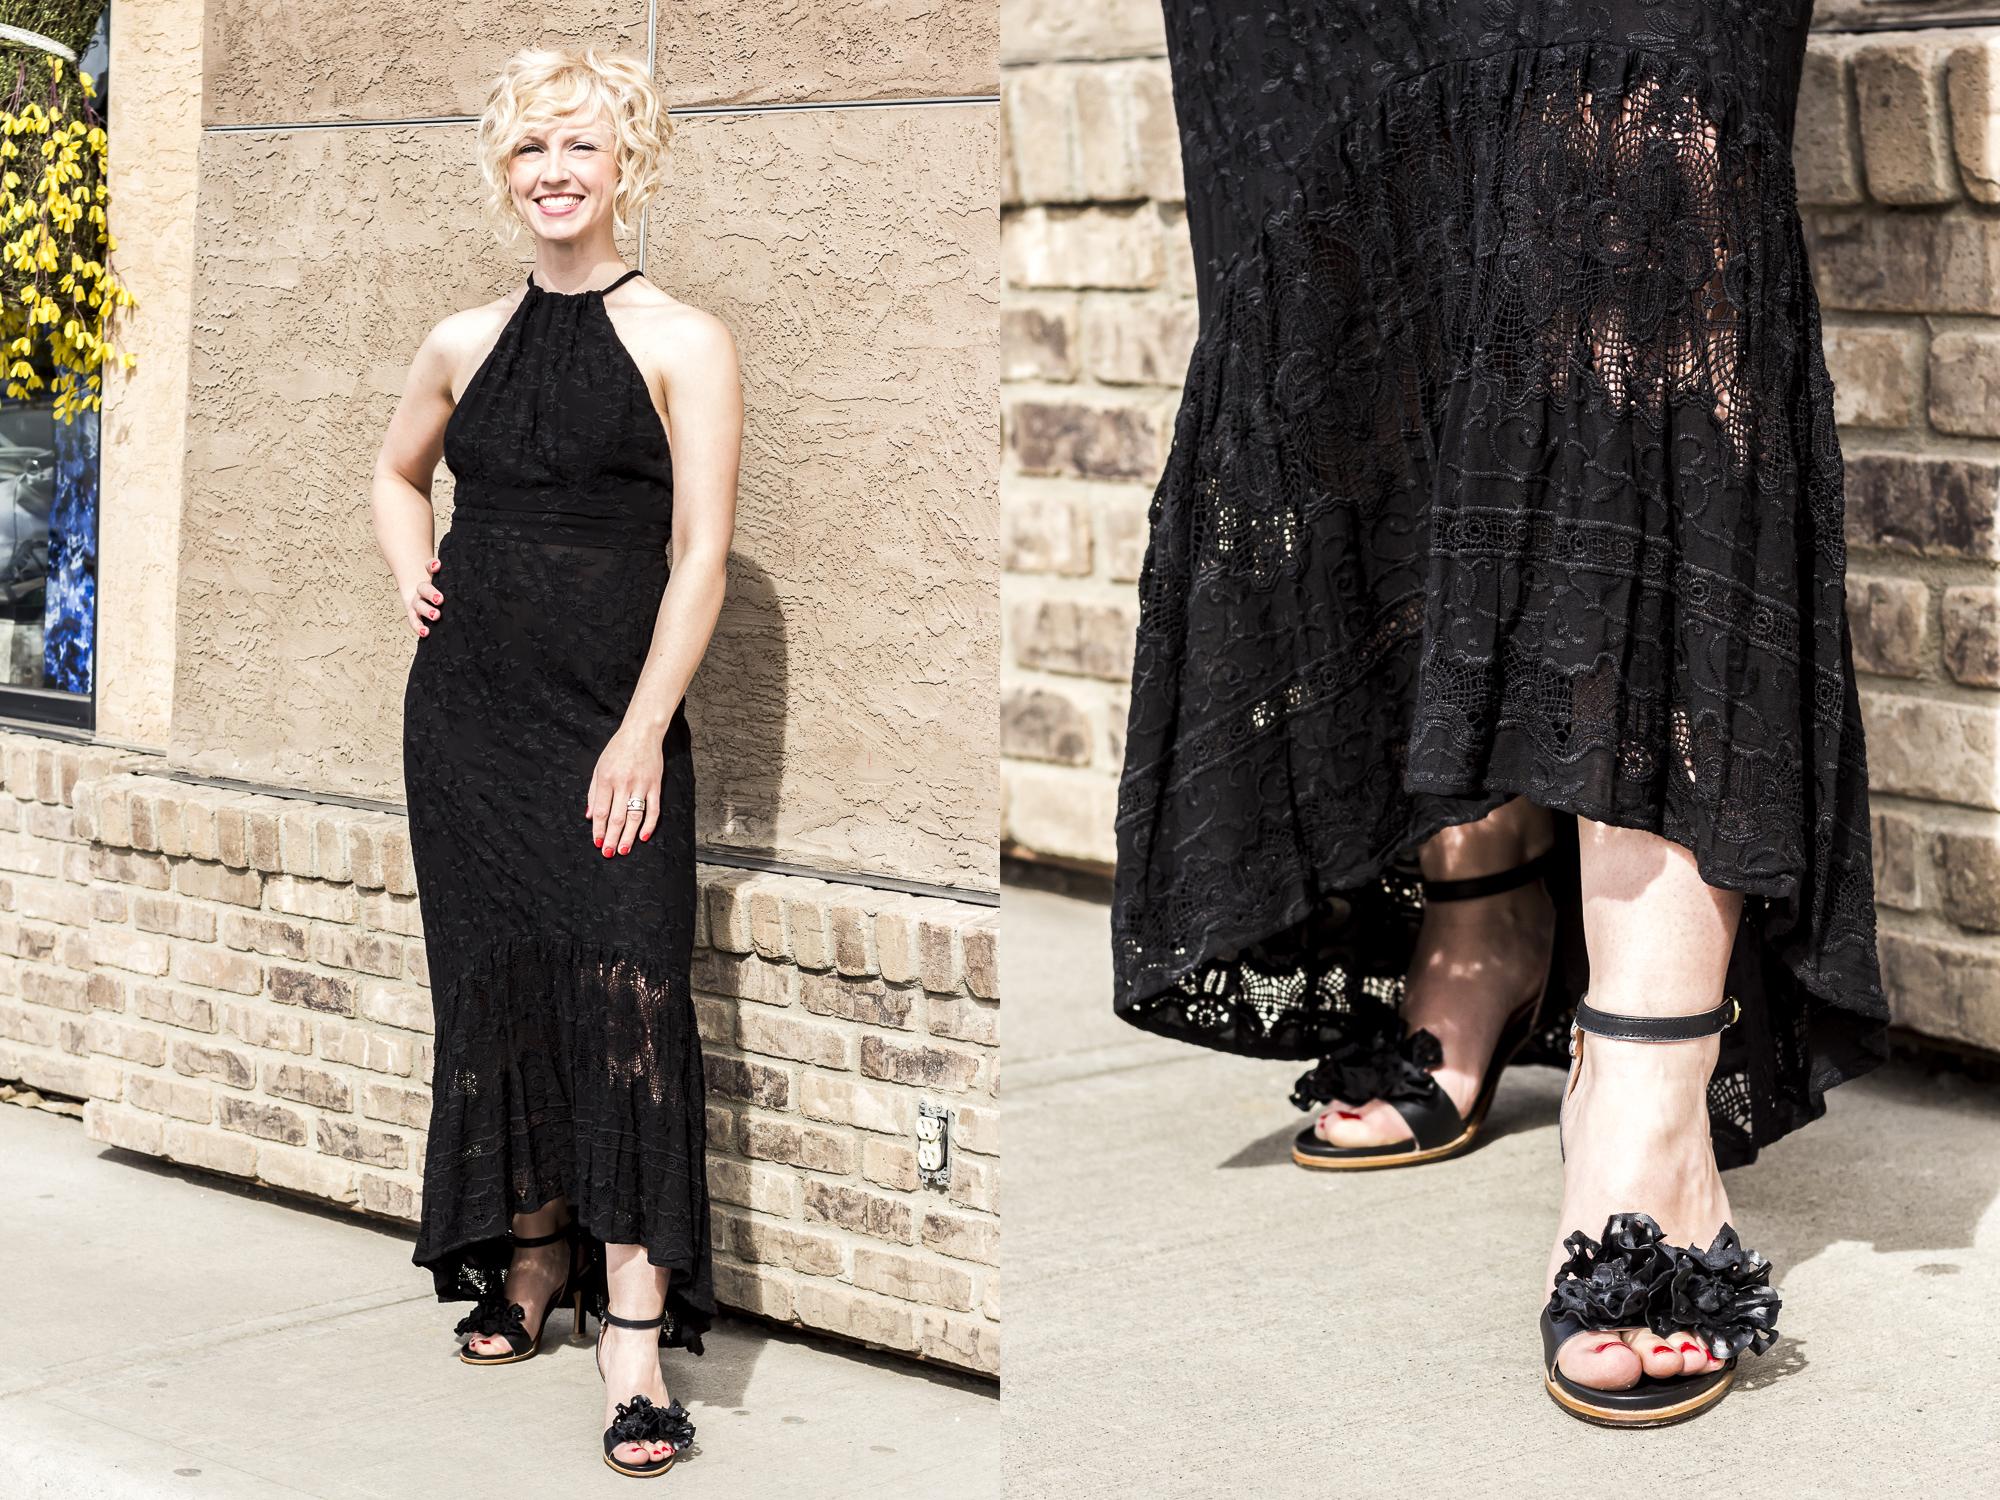 bella-maas-womens-fashion-boutique-edmonton-sherwood-park-st-albert-05